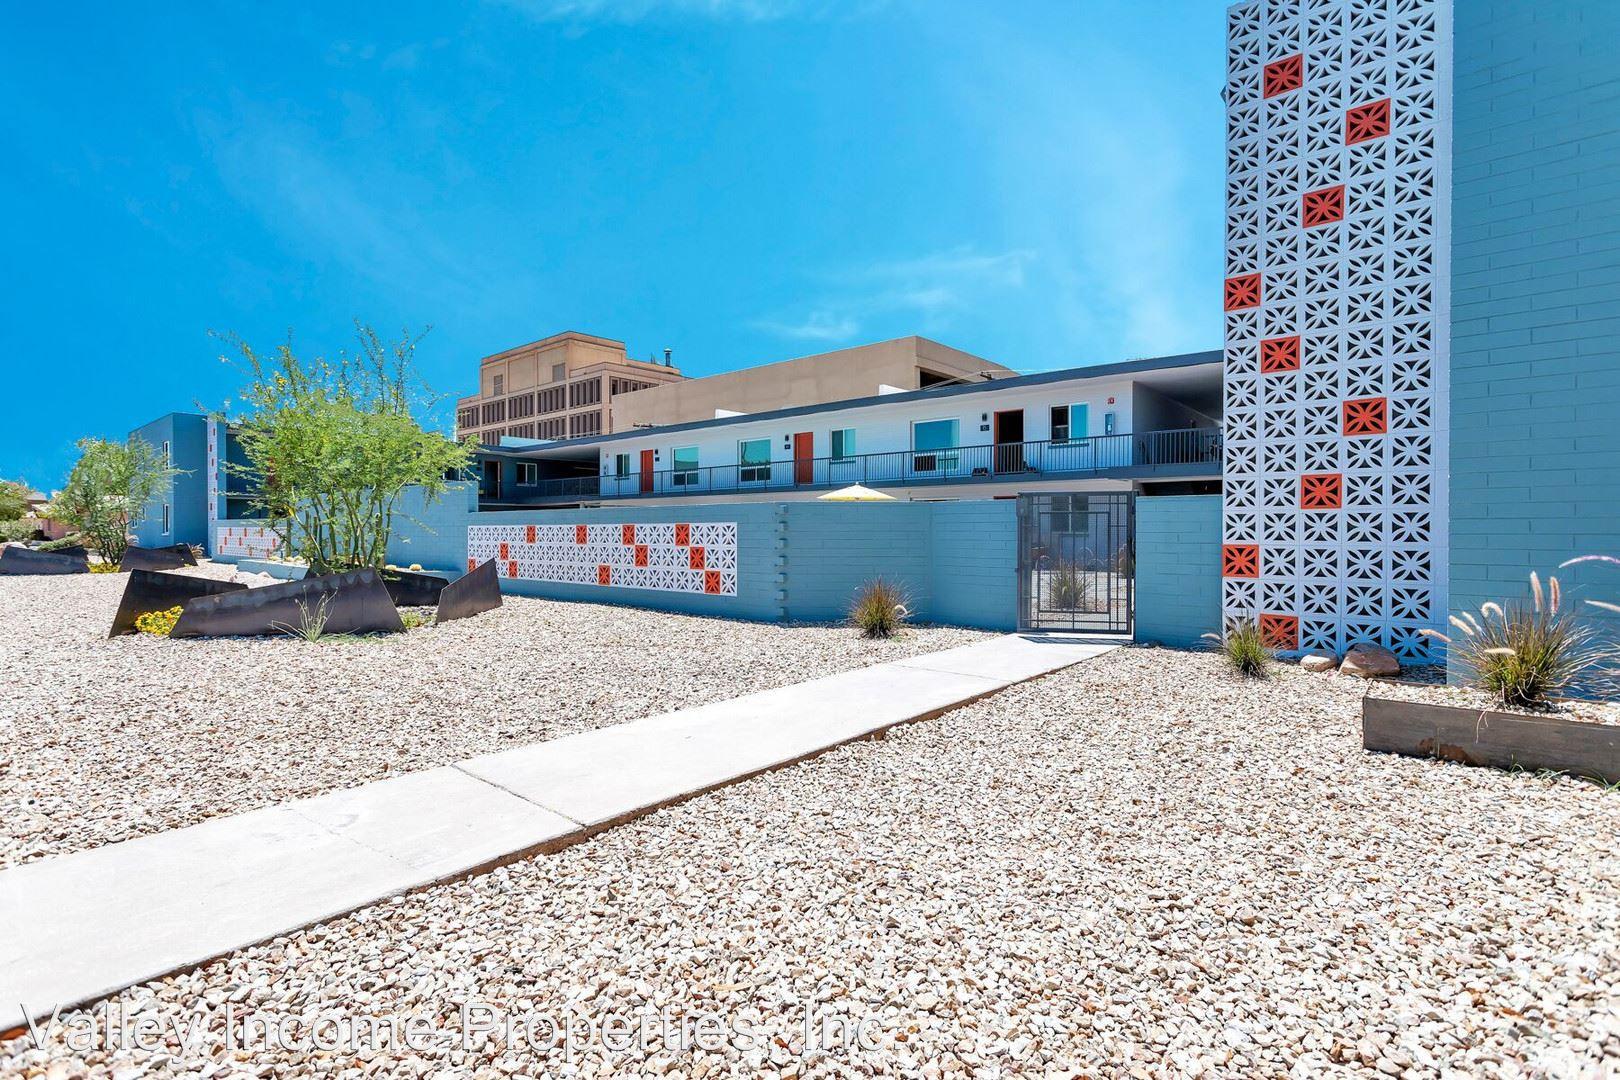 Tana Lea Apartments rental